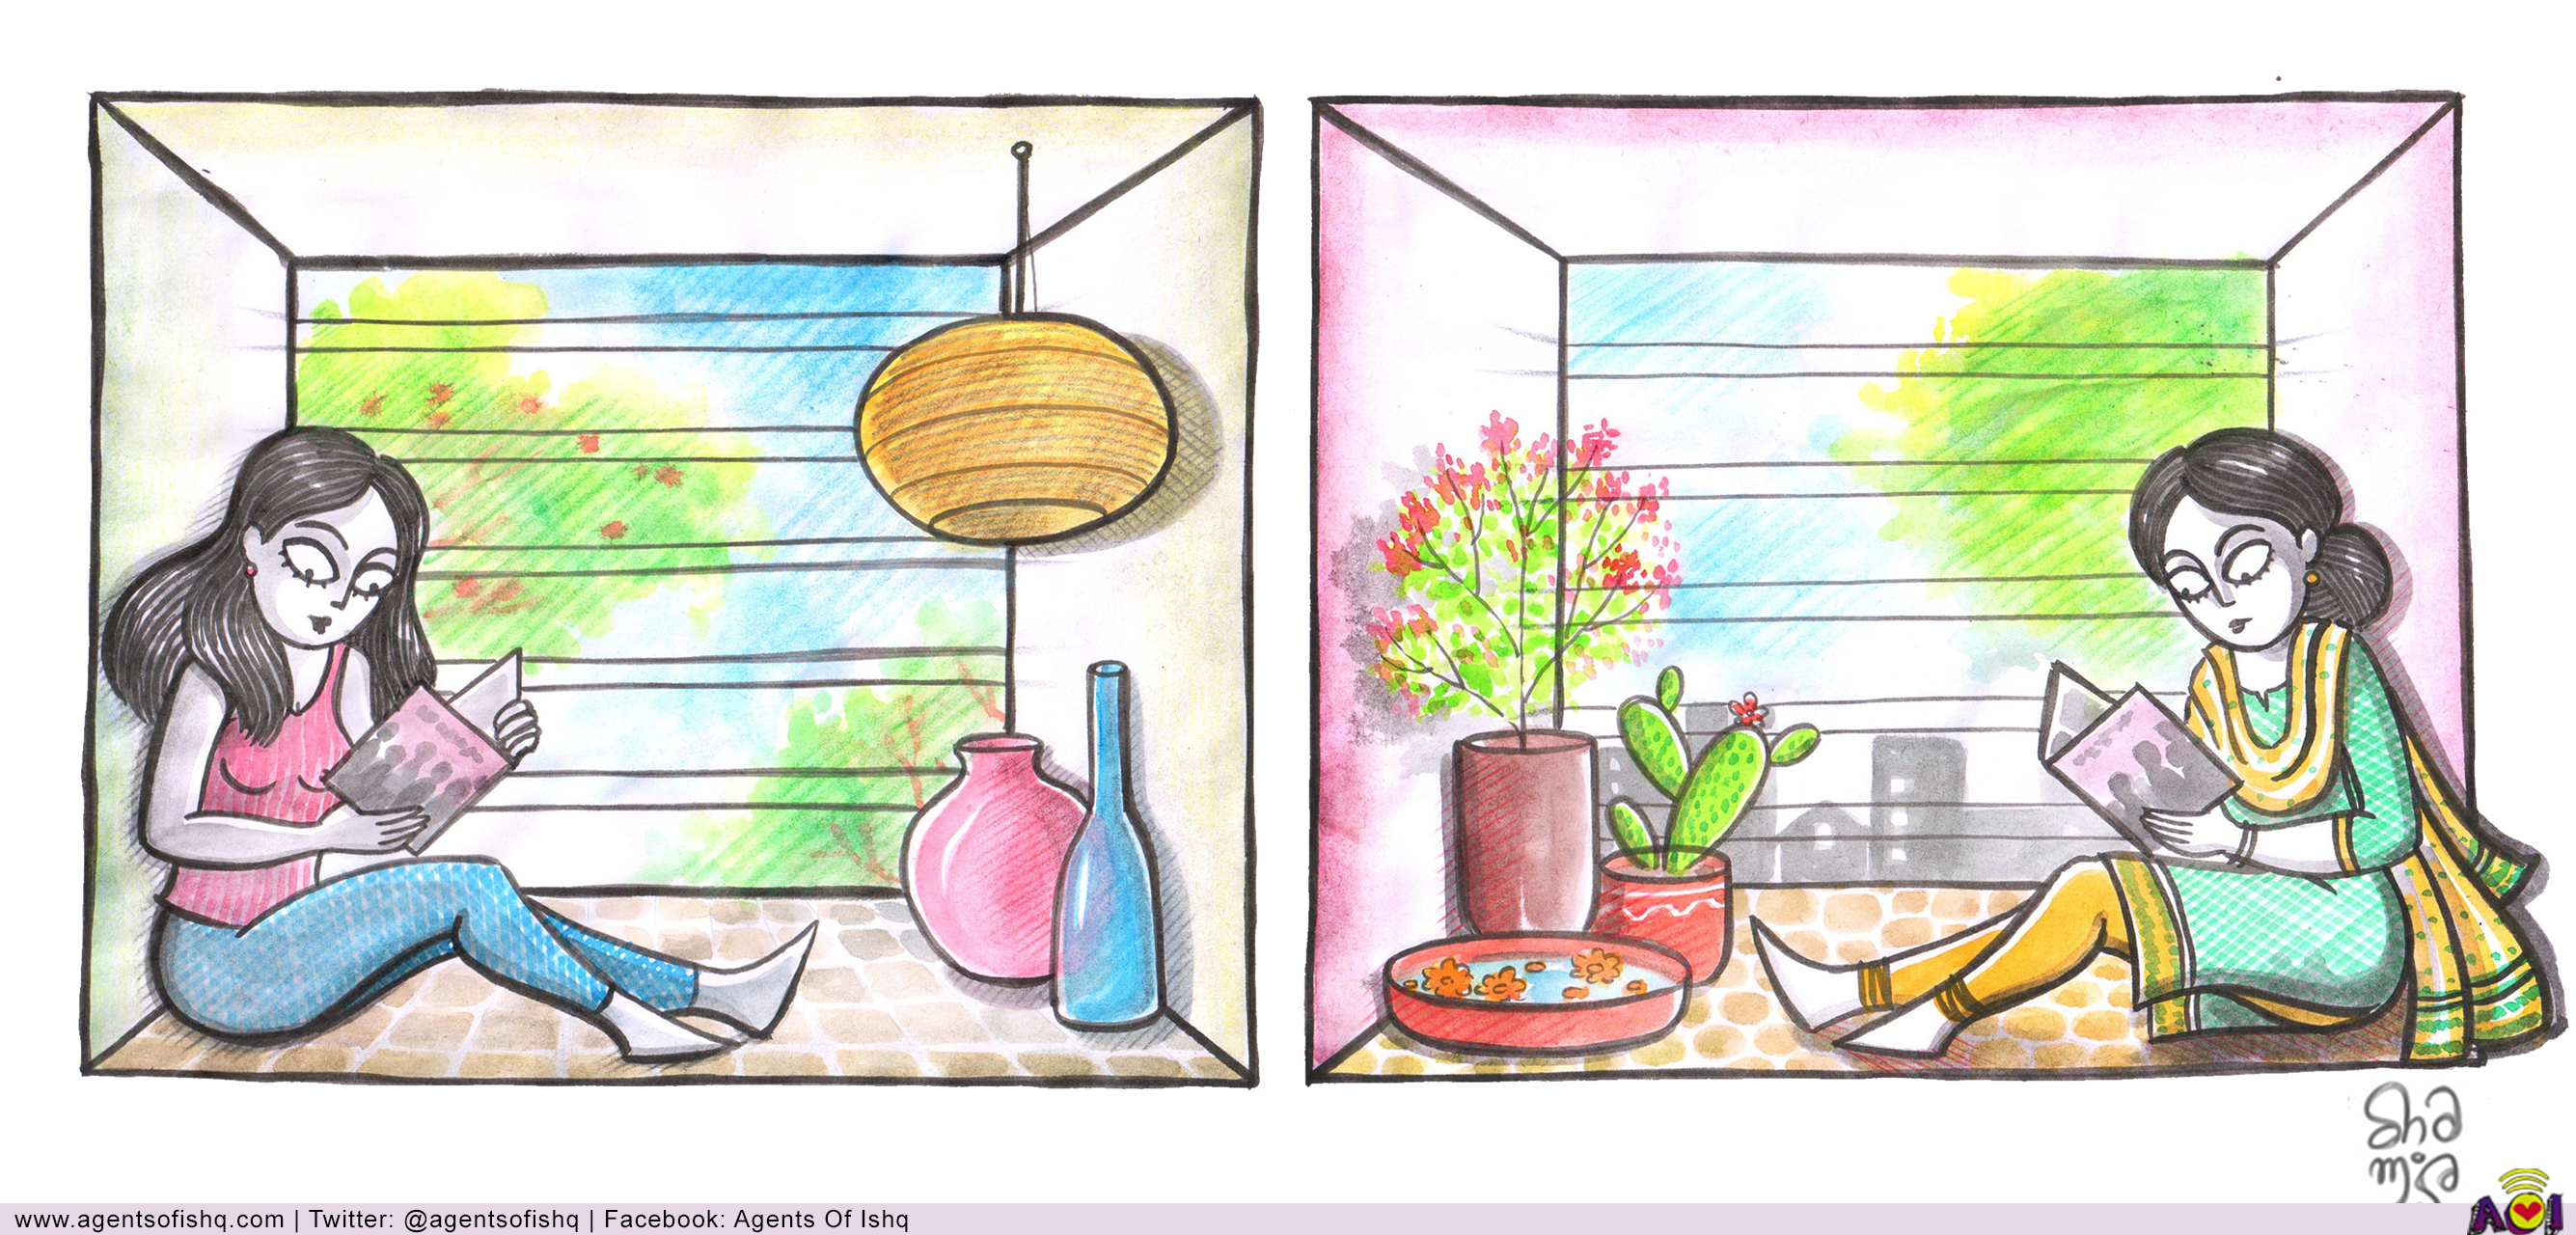 Illustration by Samidha Gunjal